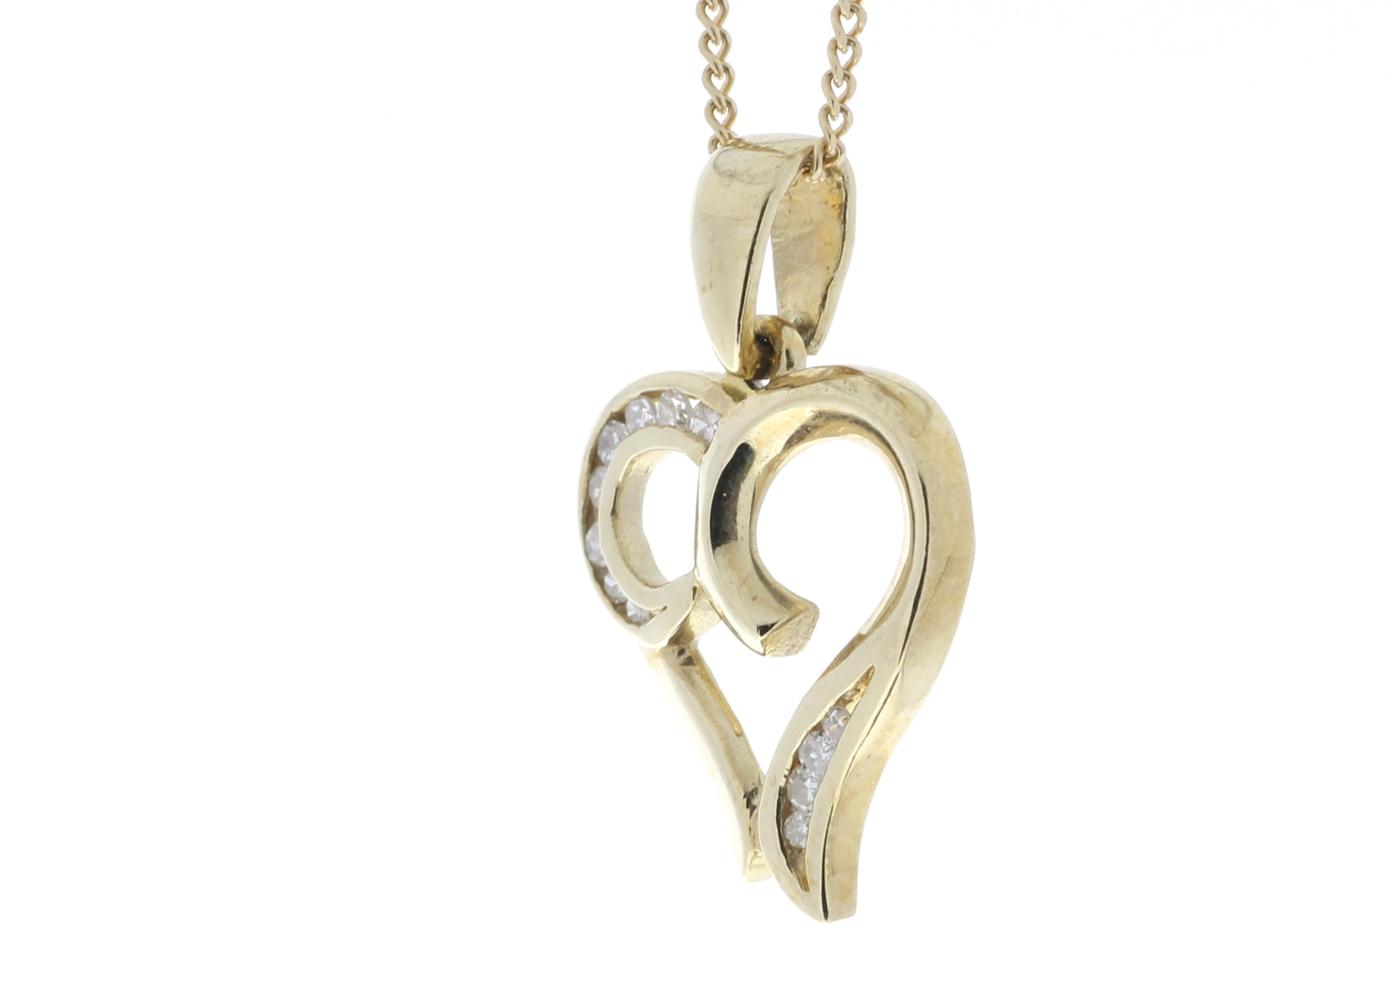 9ct Yellow Gold Diamond Heart Pendant - Image 4 of 4